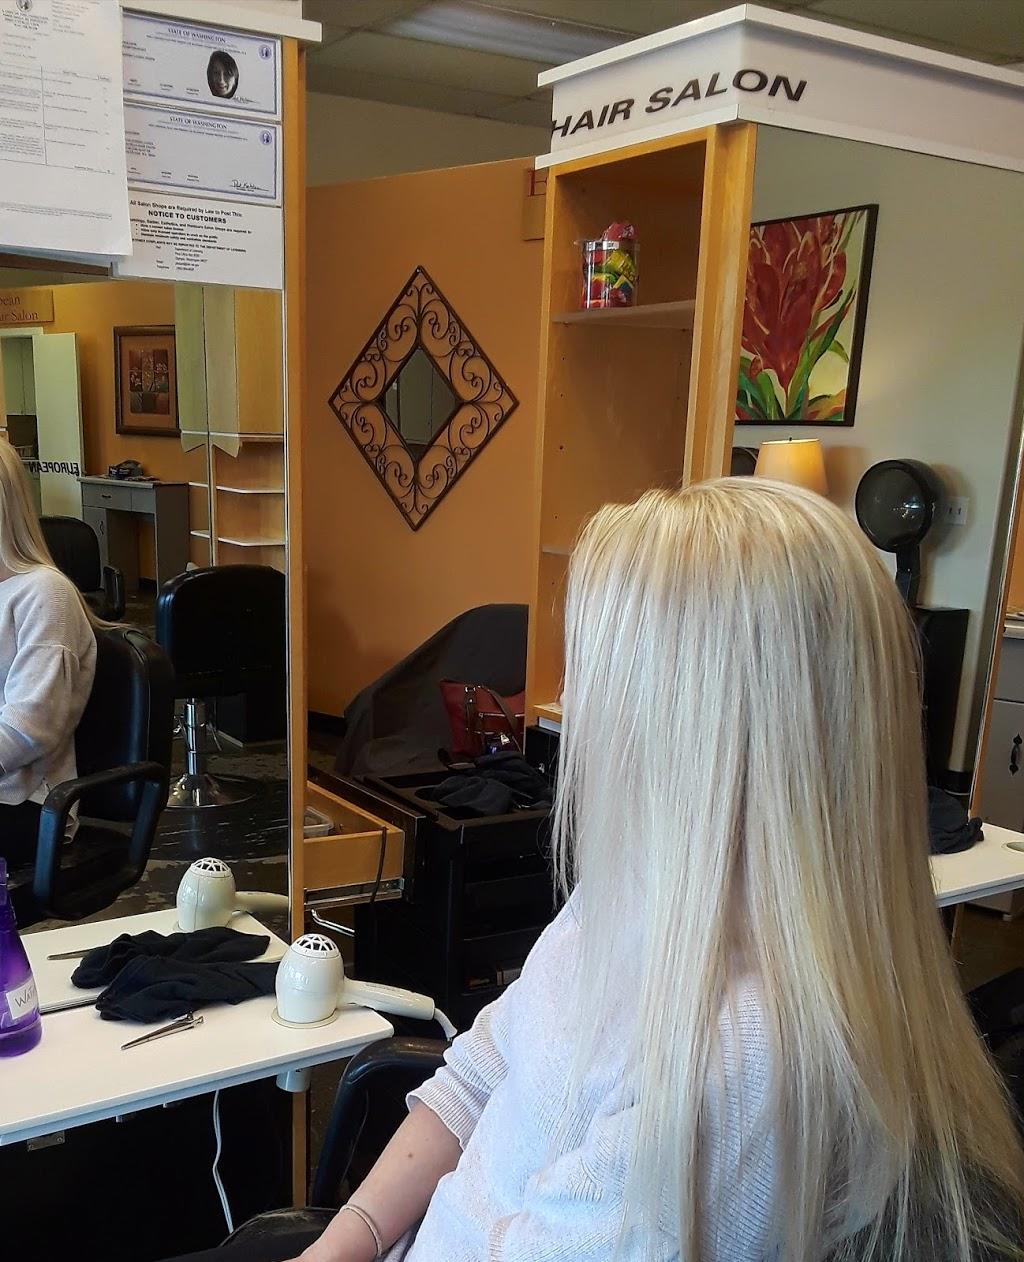 European hair salon - hair care    Photo 1 of 3   Address: 330 NE Chkalov Dr, Vancouver, WA 98684, USA   Phone: (360) 892-4904